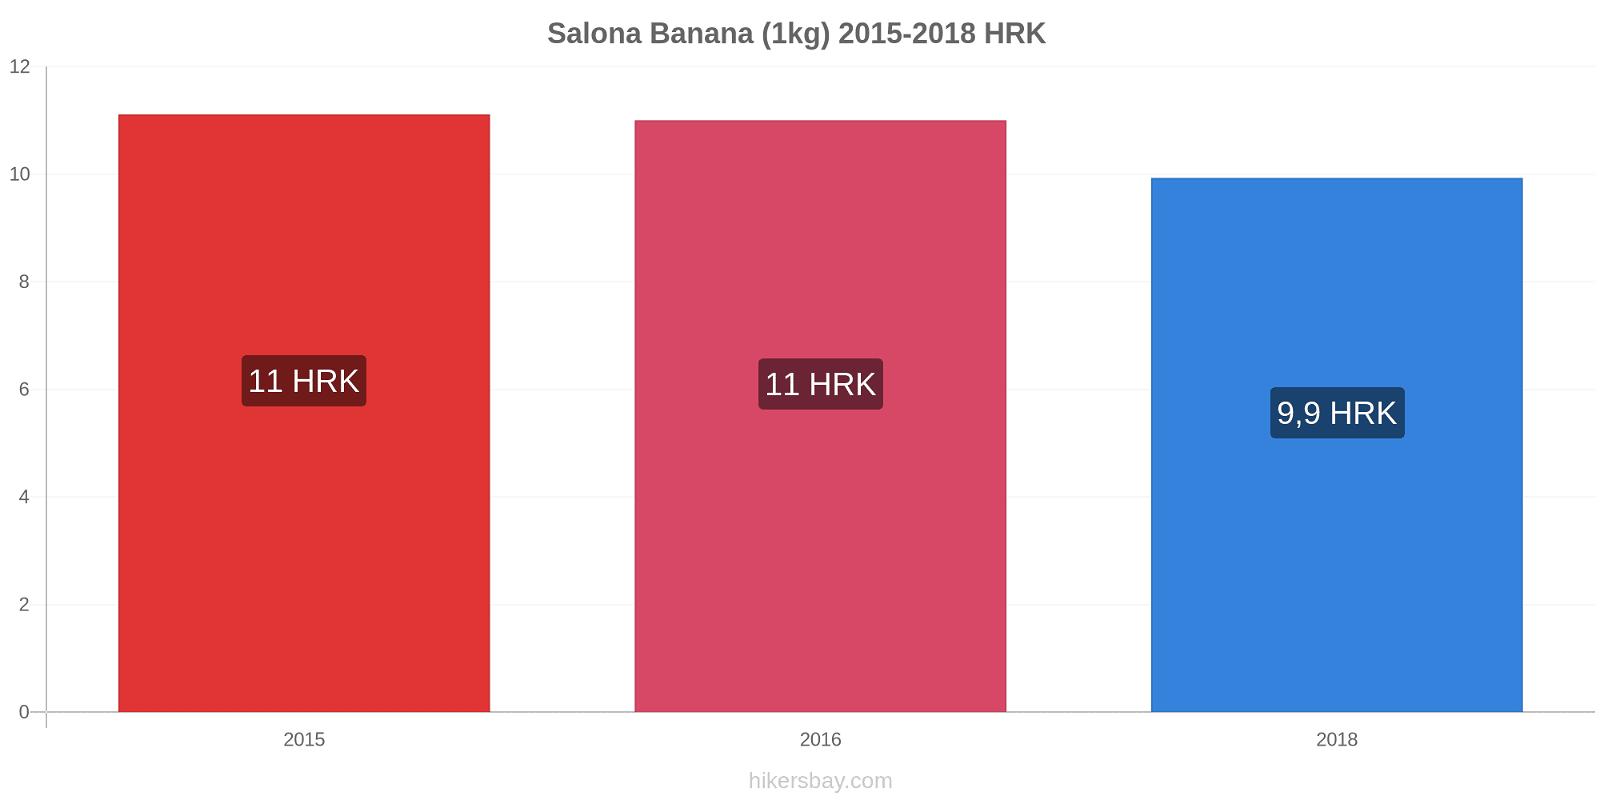 Salona variazioni di prezzo Banana (1kg) hikersbay.com